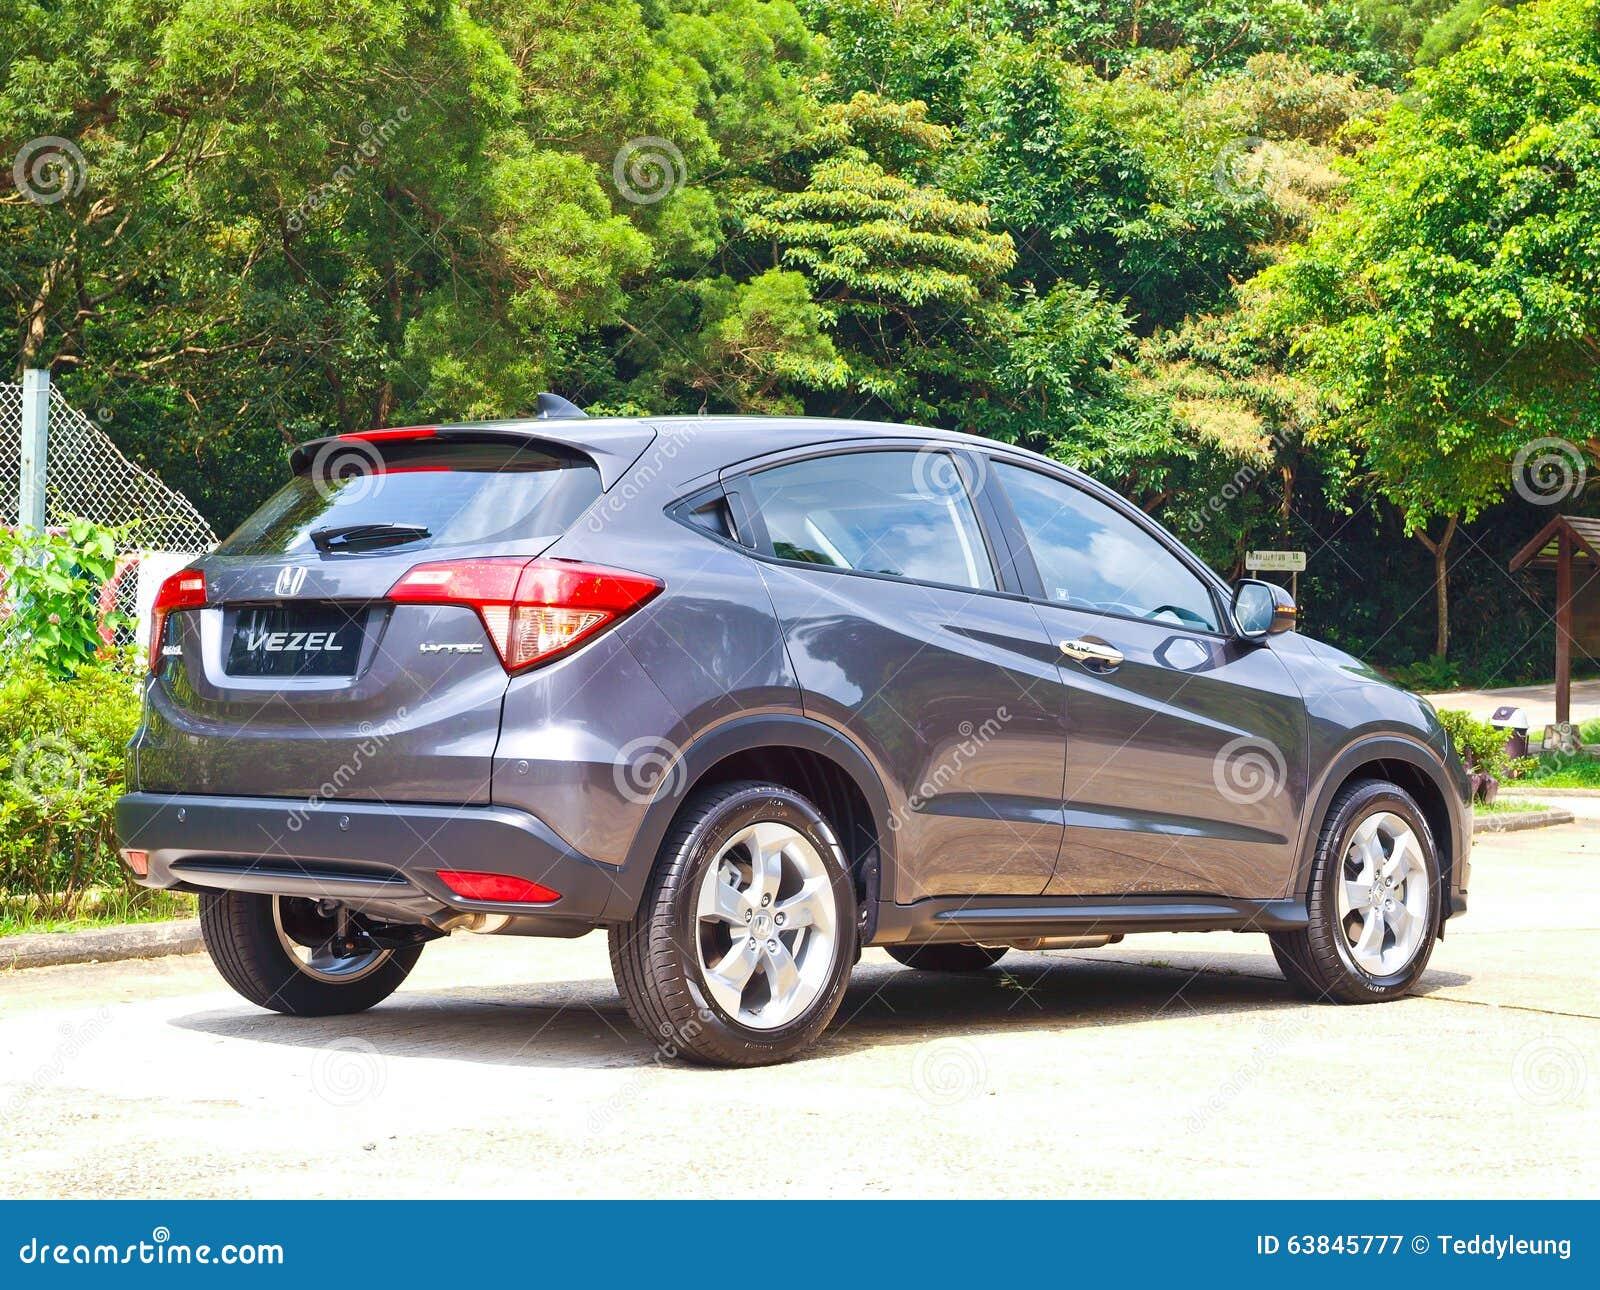 Honda Vezel 2015 Test Drive Day Editorial Photography ...